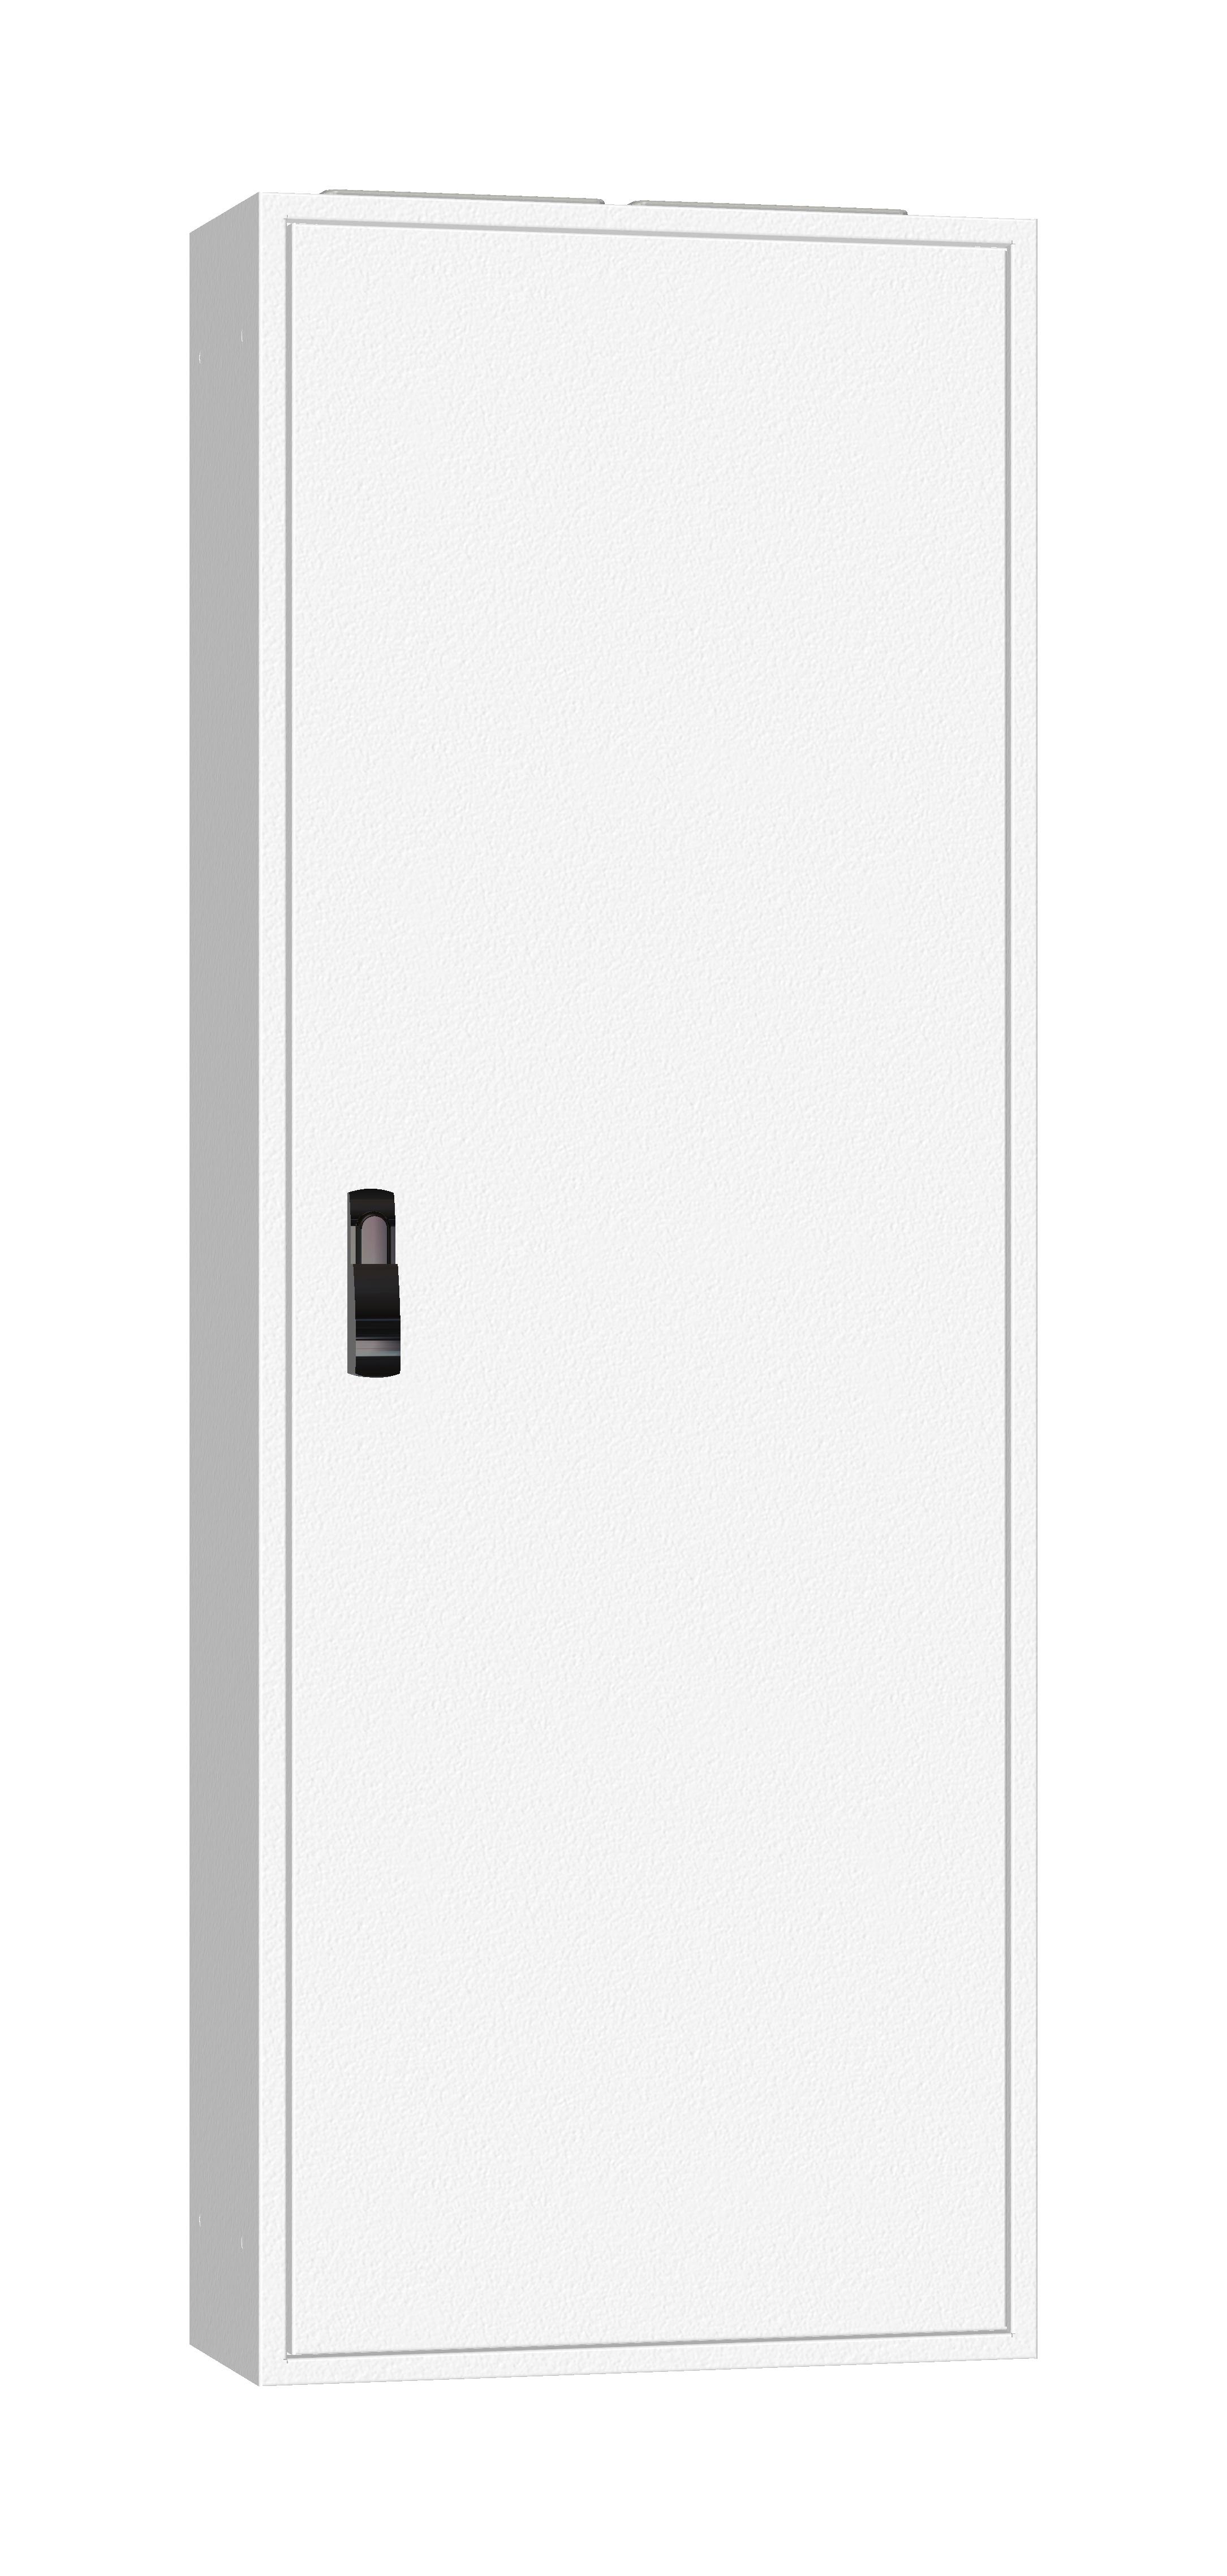 1 Stk AP-Rahmen + Tür 2A-33 T=250mm, Rückwand + Schwenkhebel, IP54 IL952233--